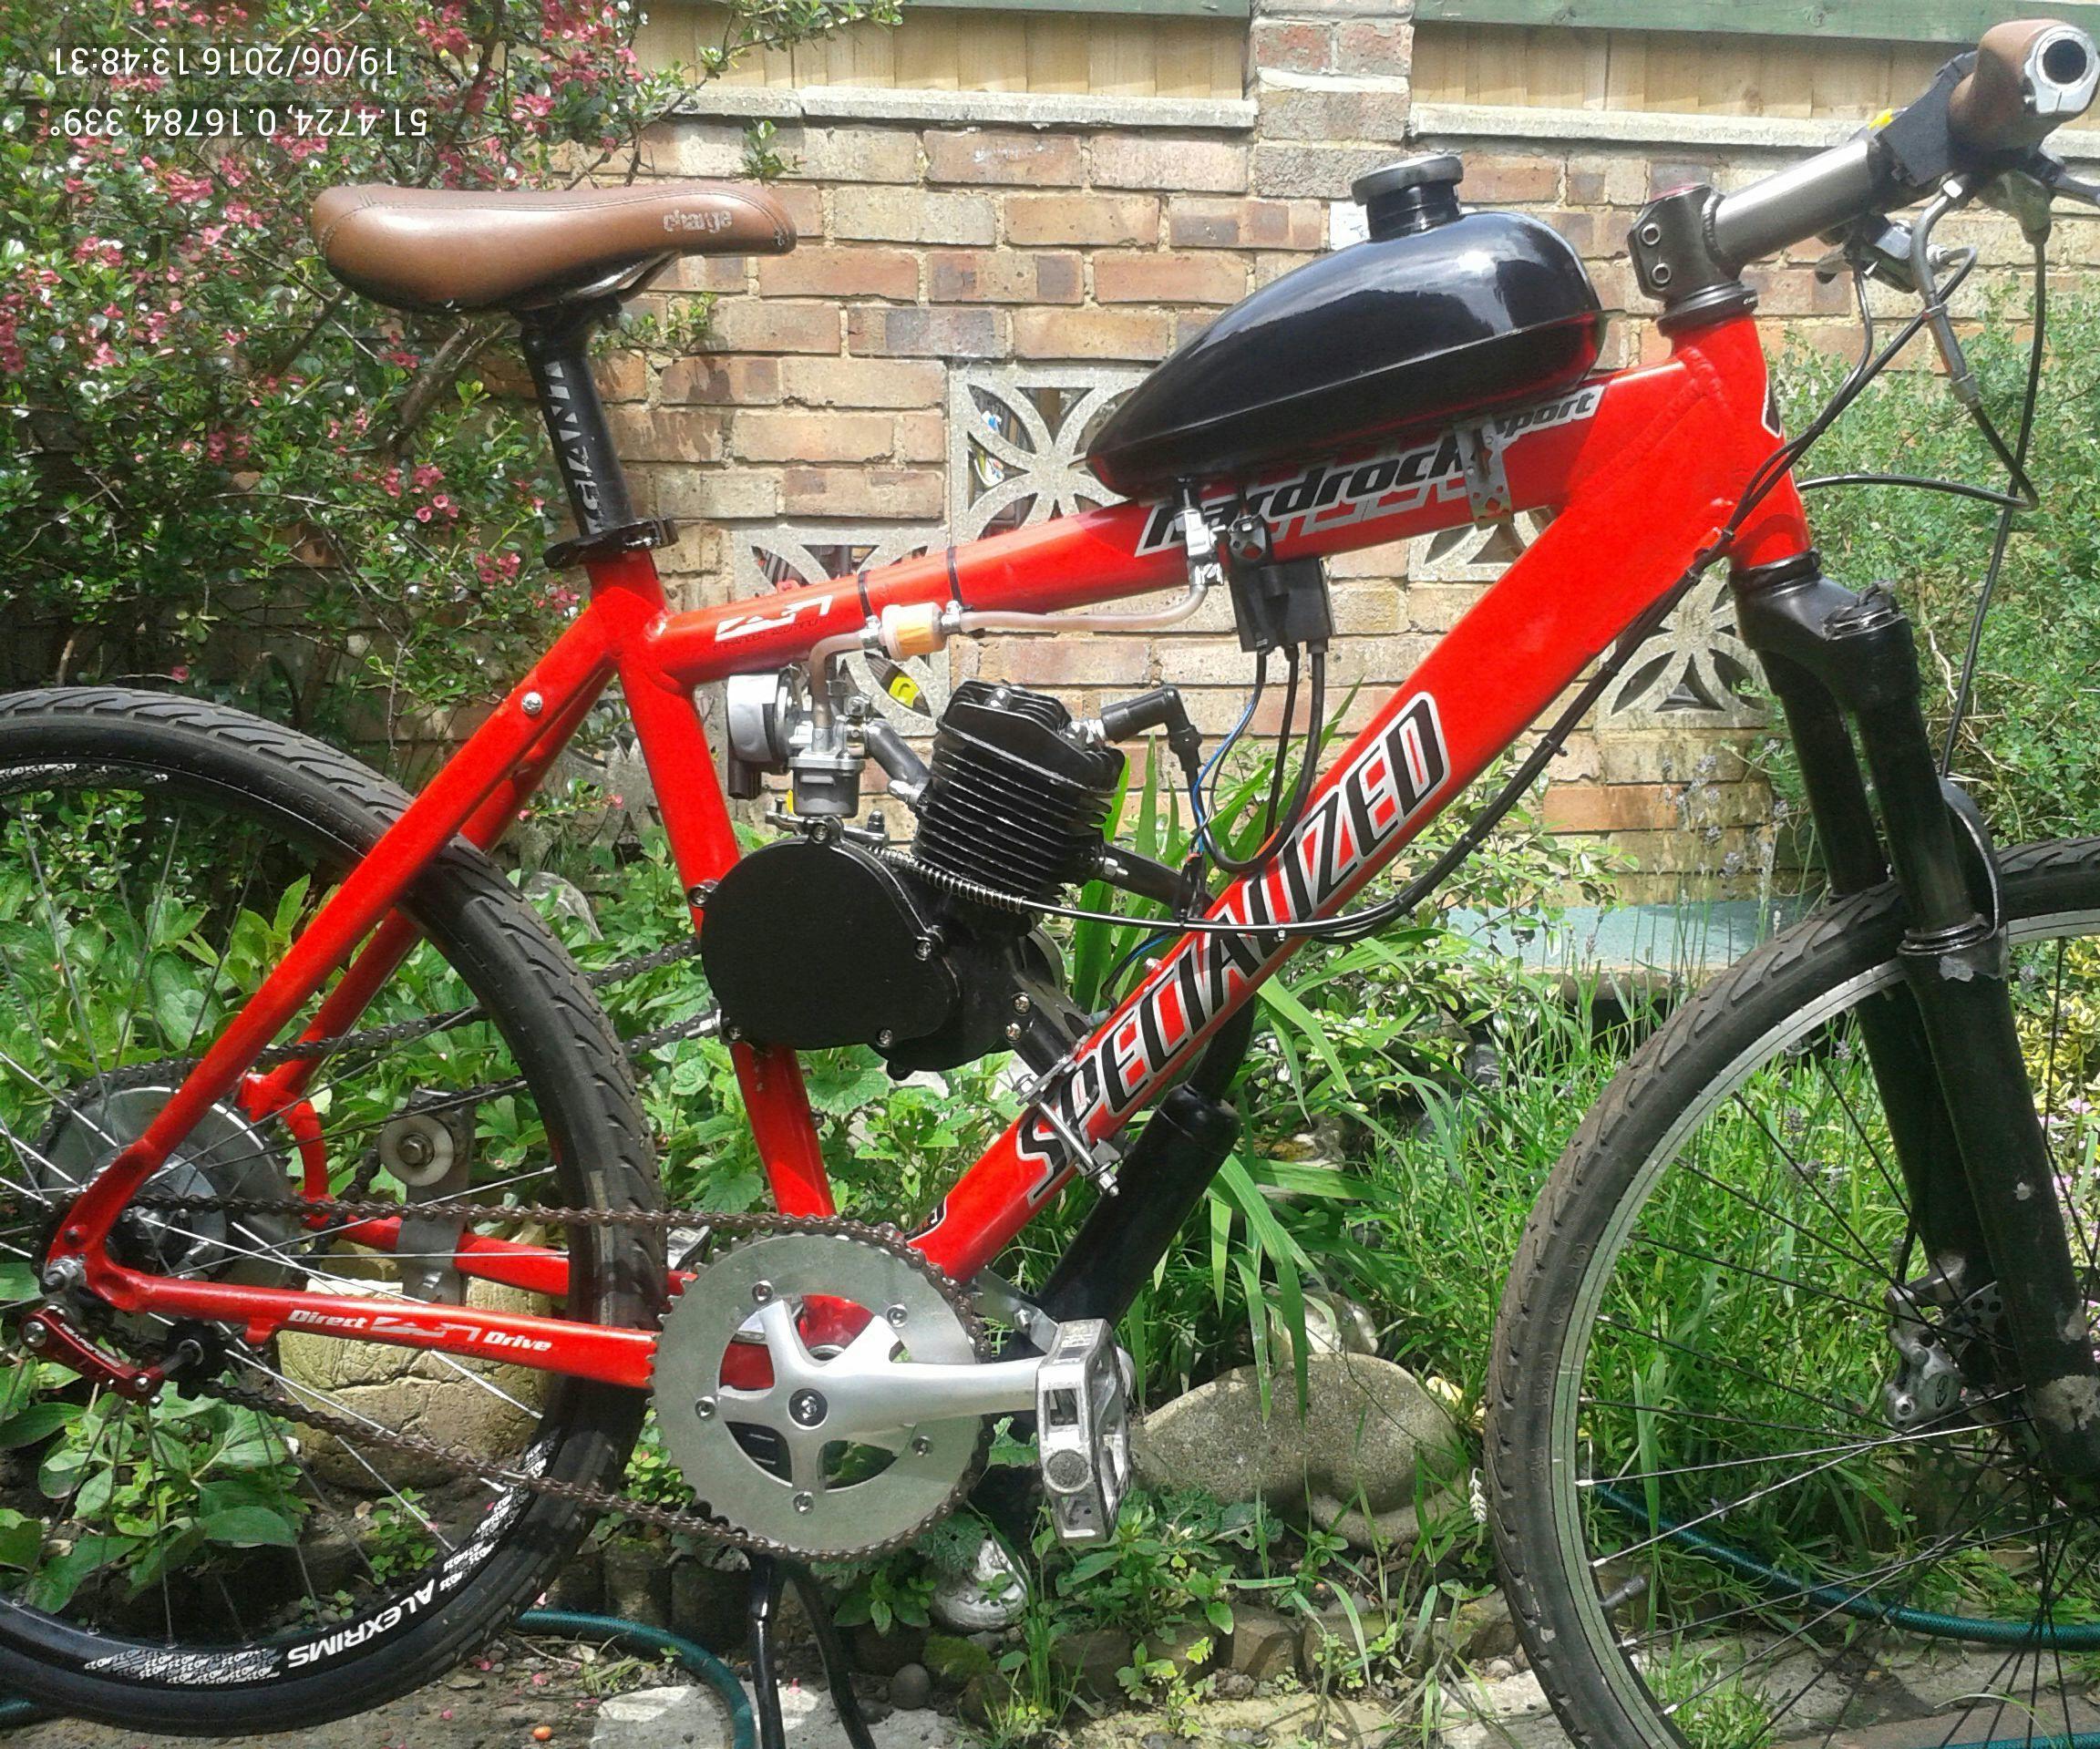 80cc 2 stroke motorized bicycle kit my notes